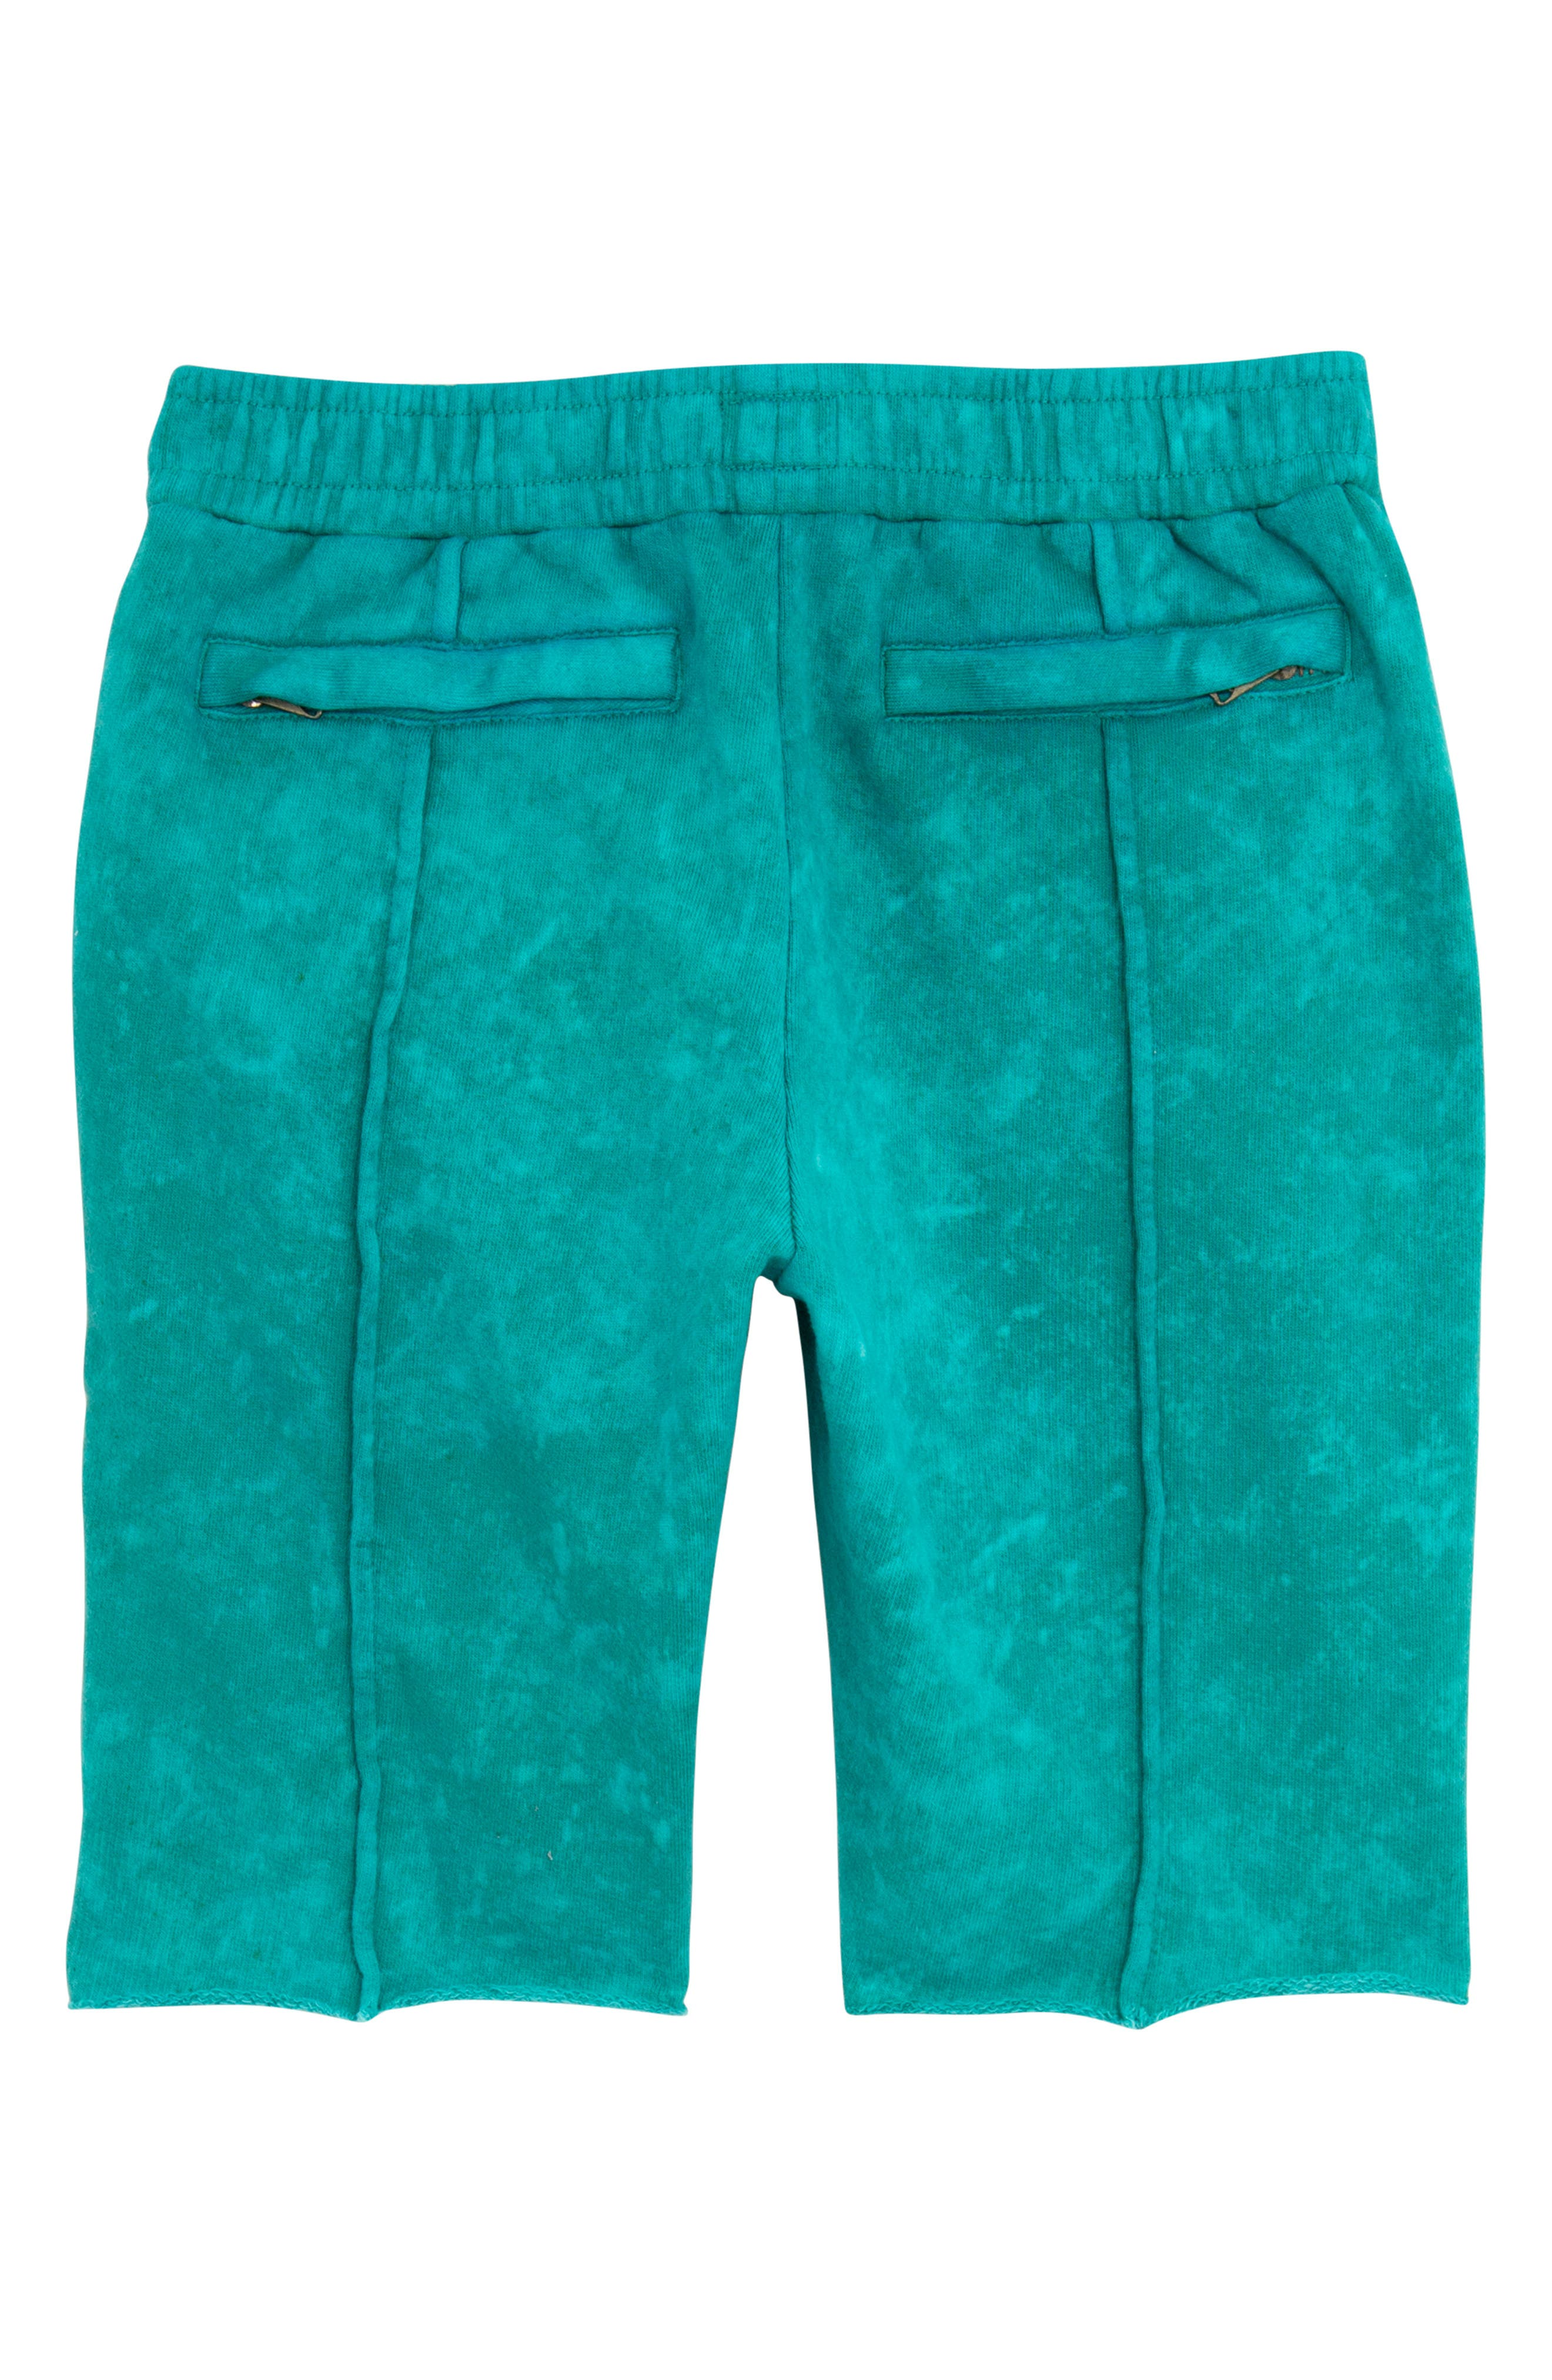 Acid Wash Pull-On Denim Shorts,                             Alternate thumbnail 2, color,                             Turquoise